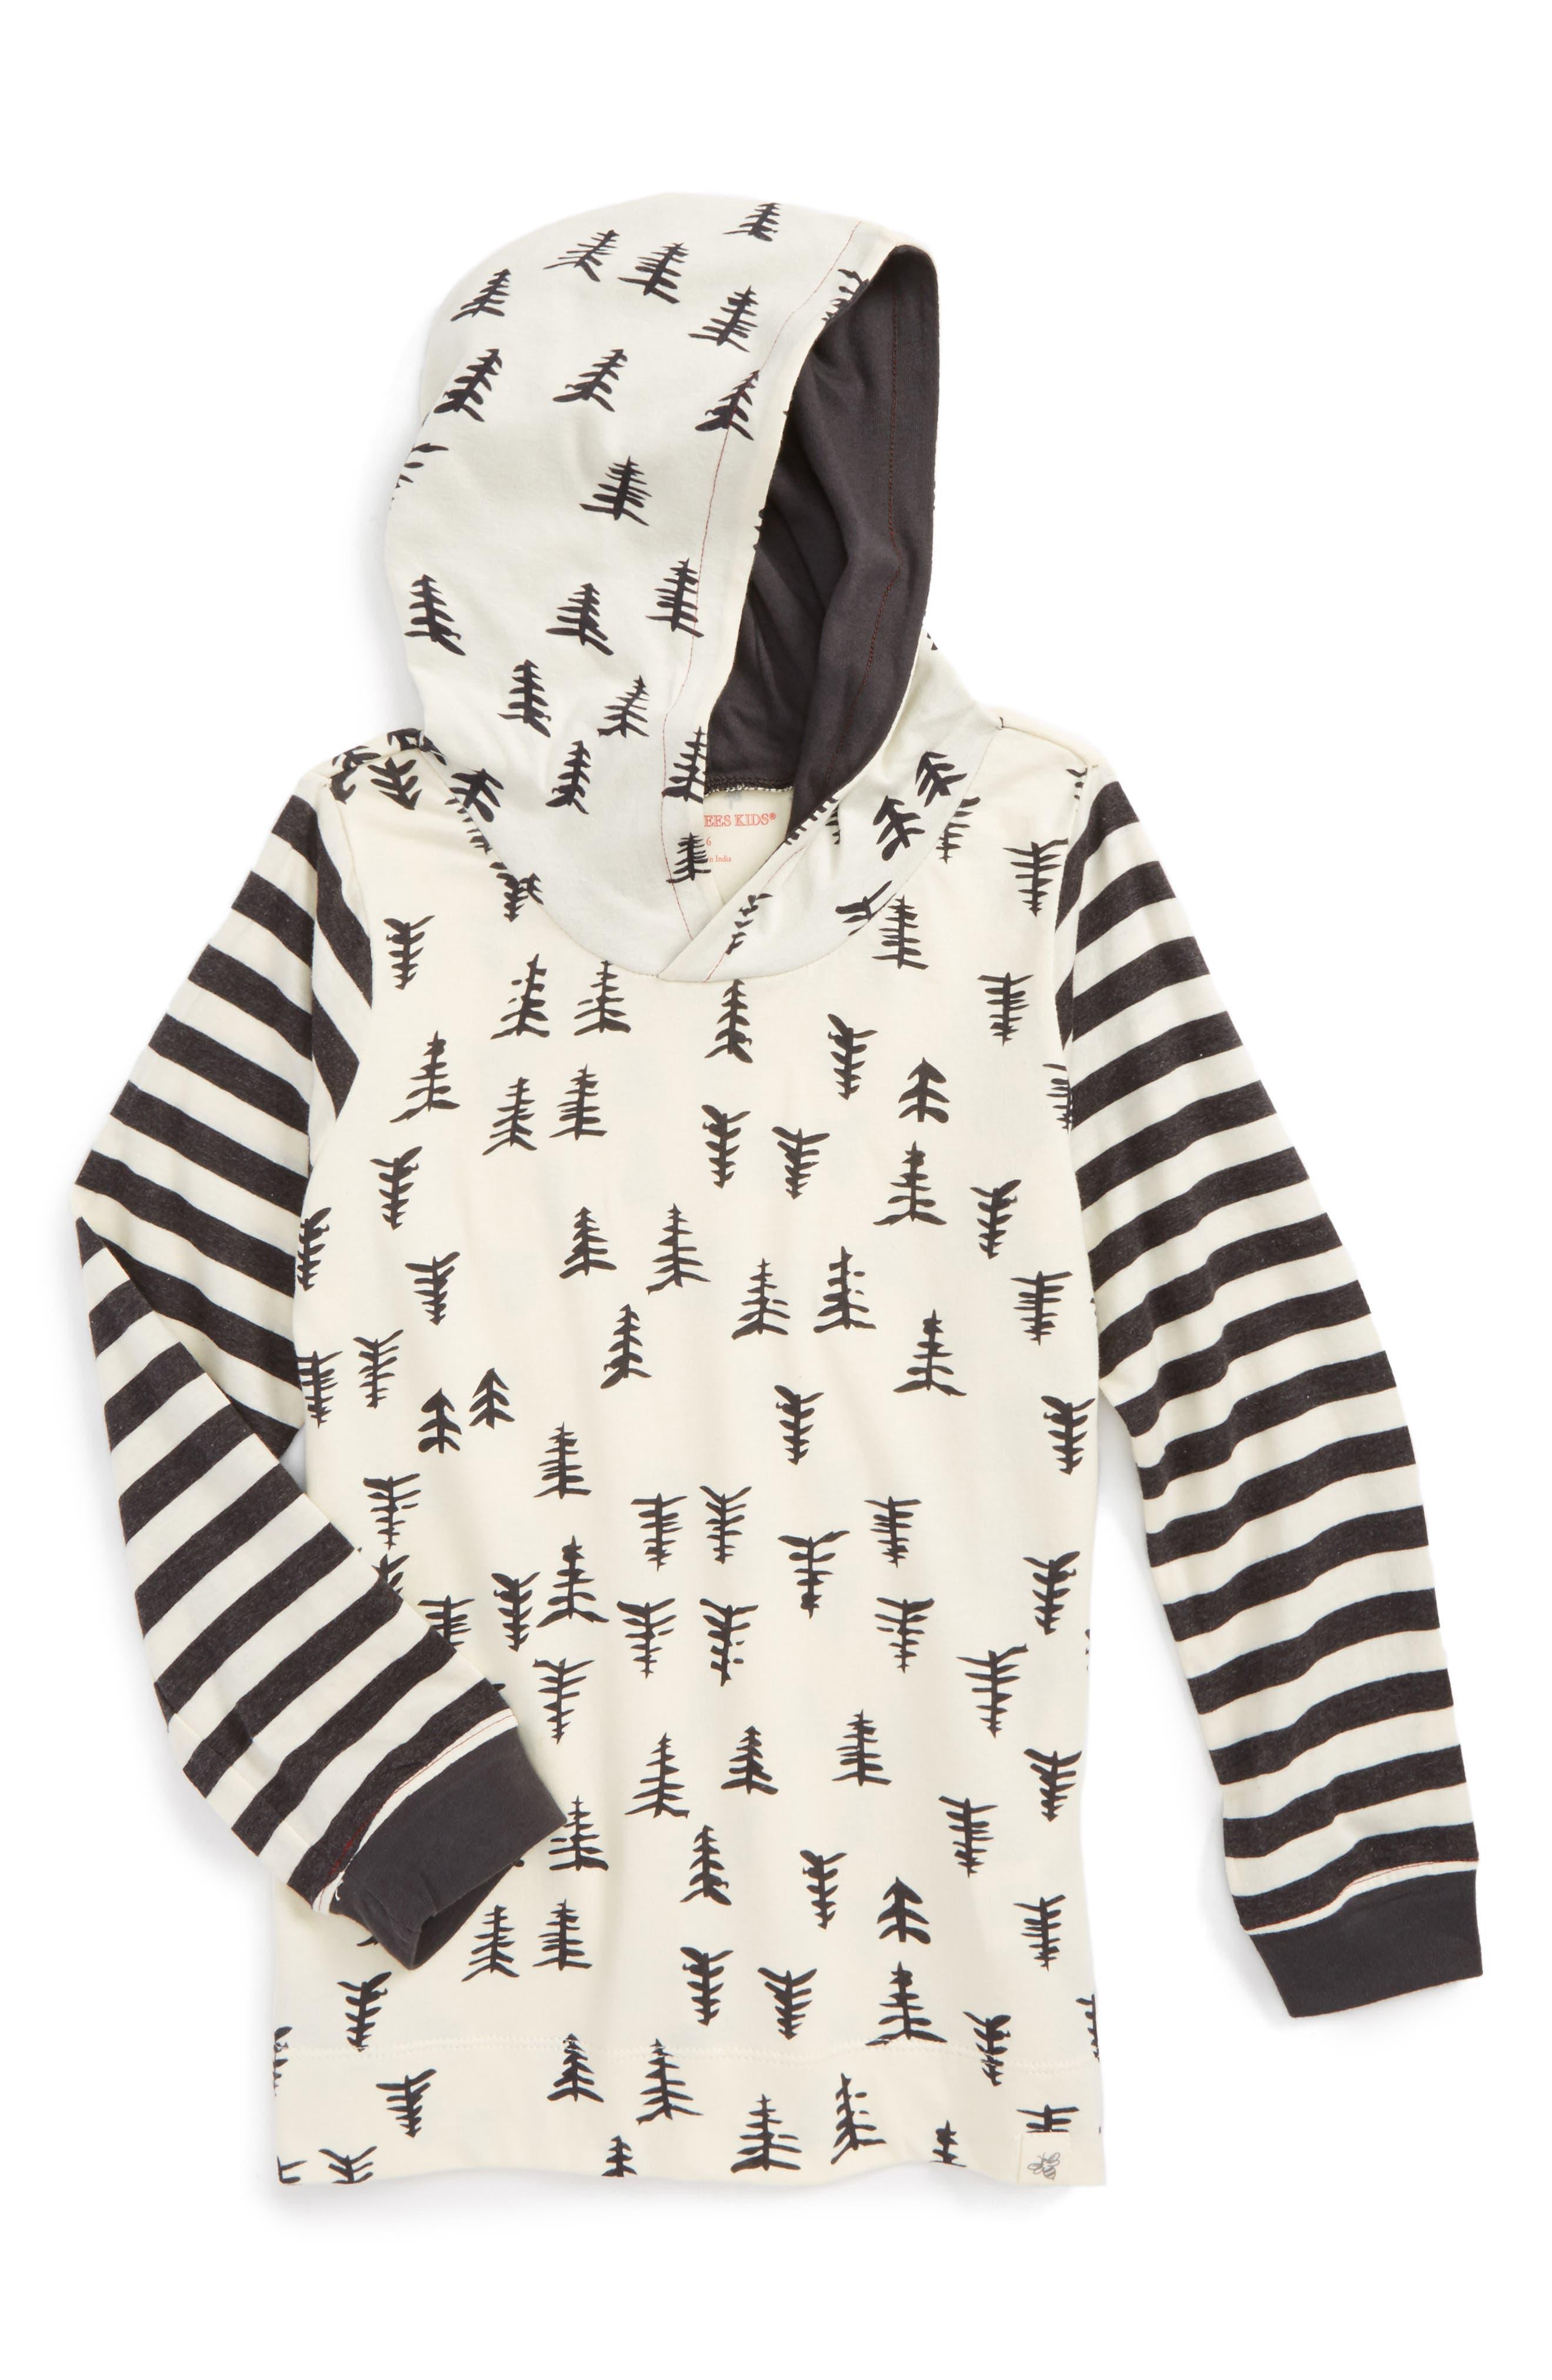 Burt's Bees Baby Trees & Stripes Organic Cotton Hooded T-Shirt (Toddler Boys & Little Boys)